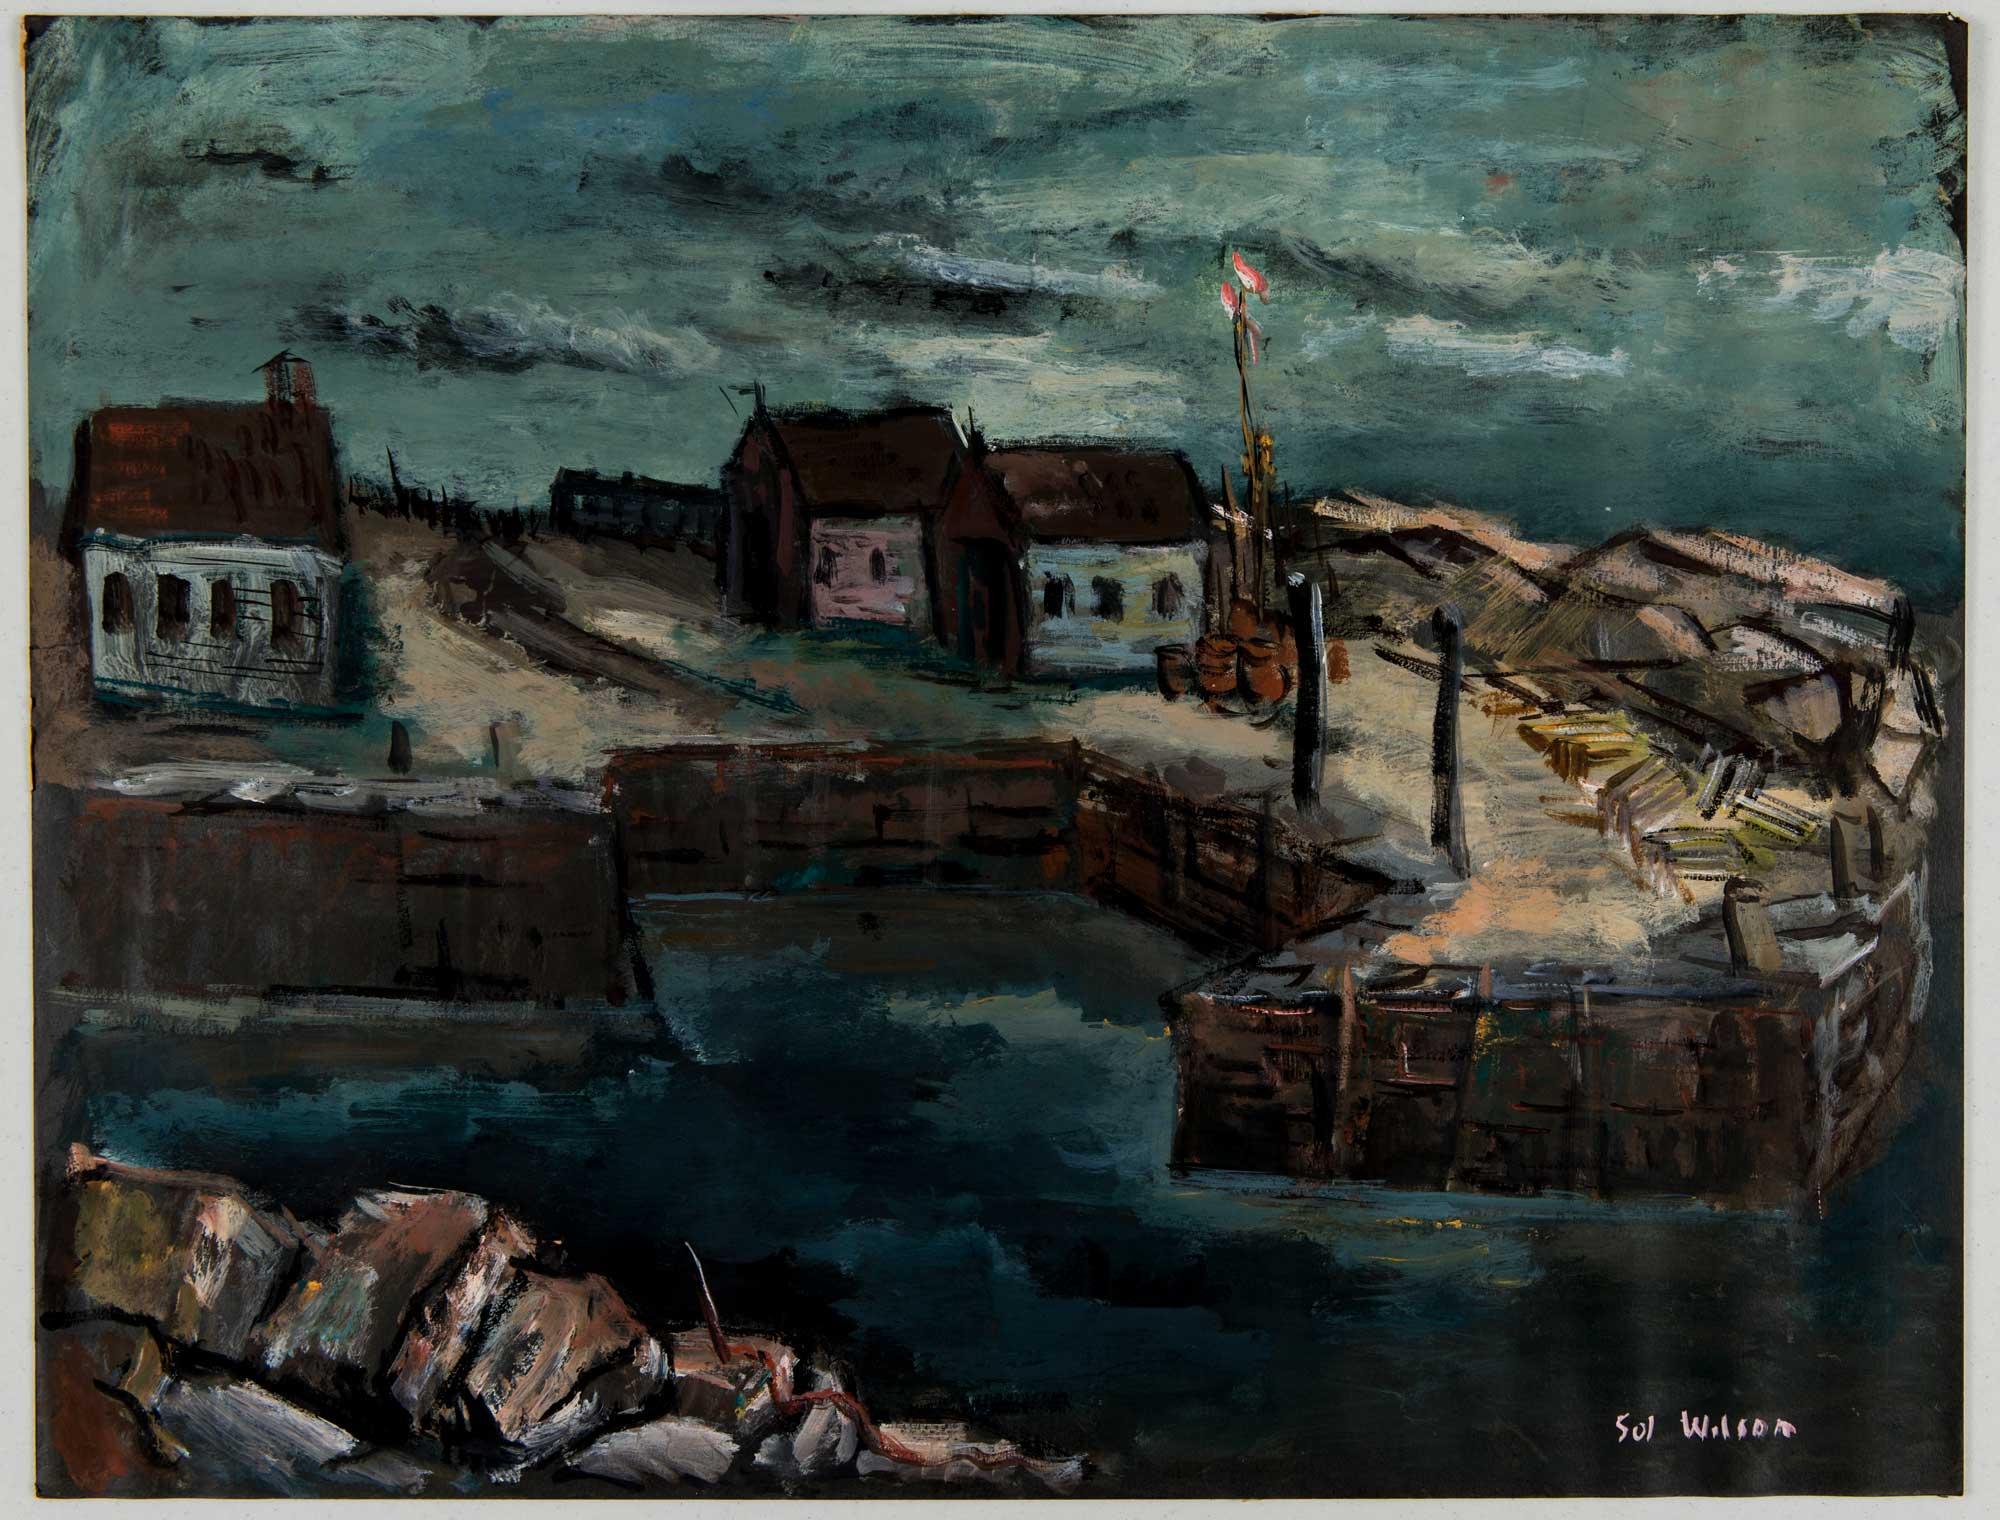 Landscape of a fishing village